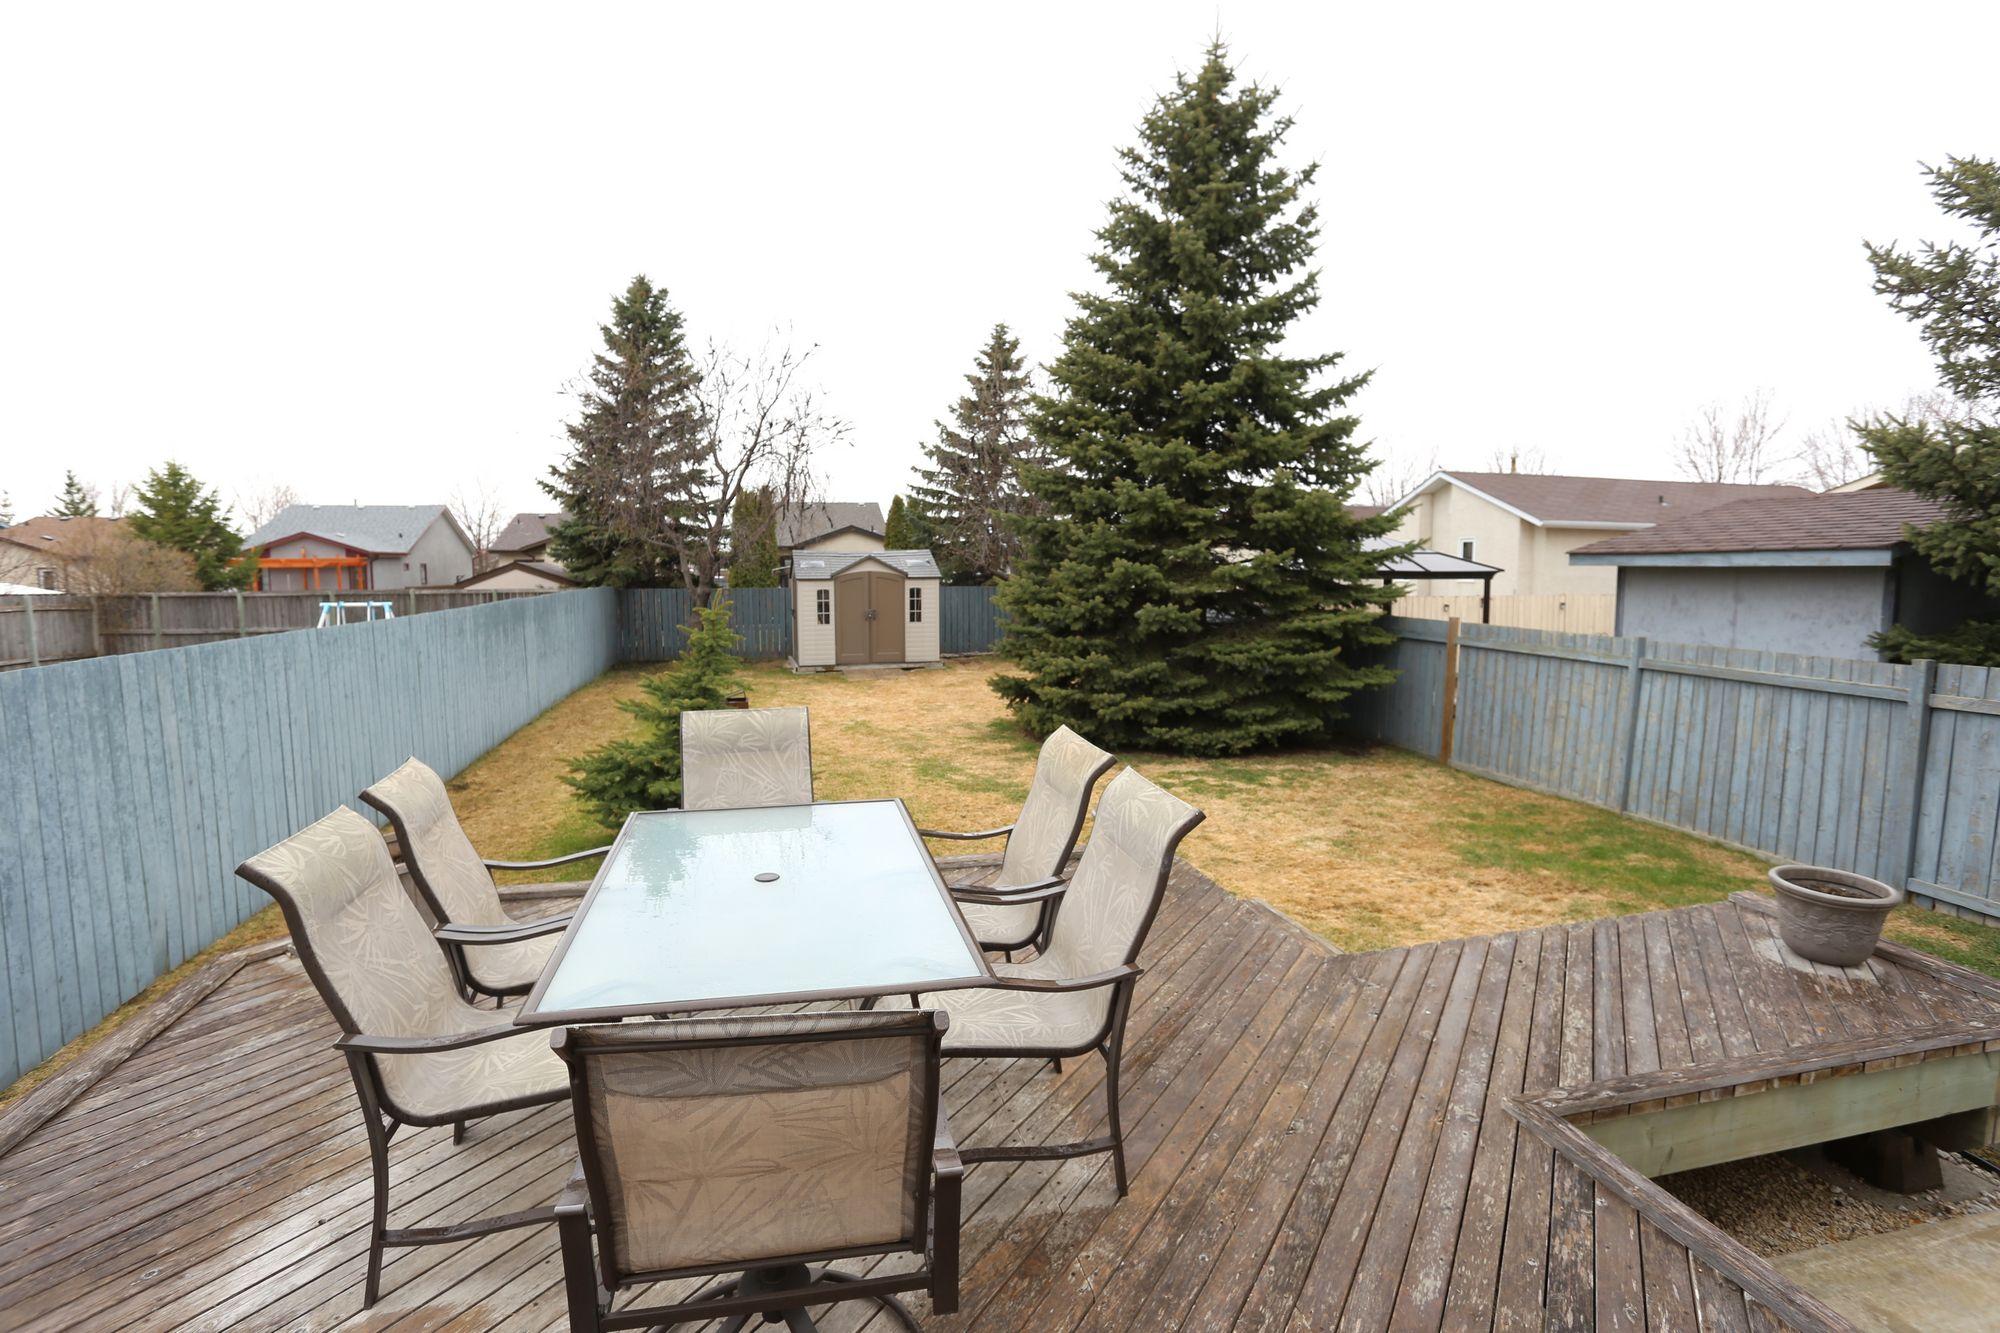 57 Chisholm Drive, Winnipeg, Manitoba  R2R 2T7 - Photo 16 - 1709467